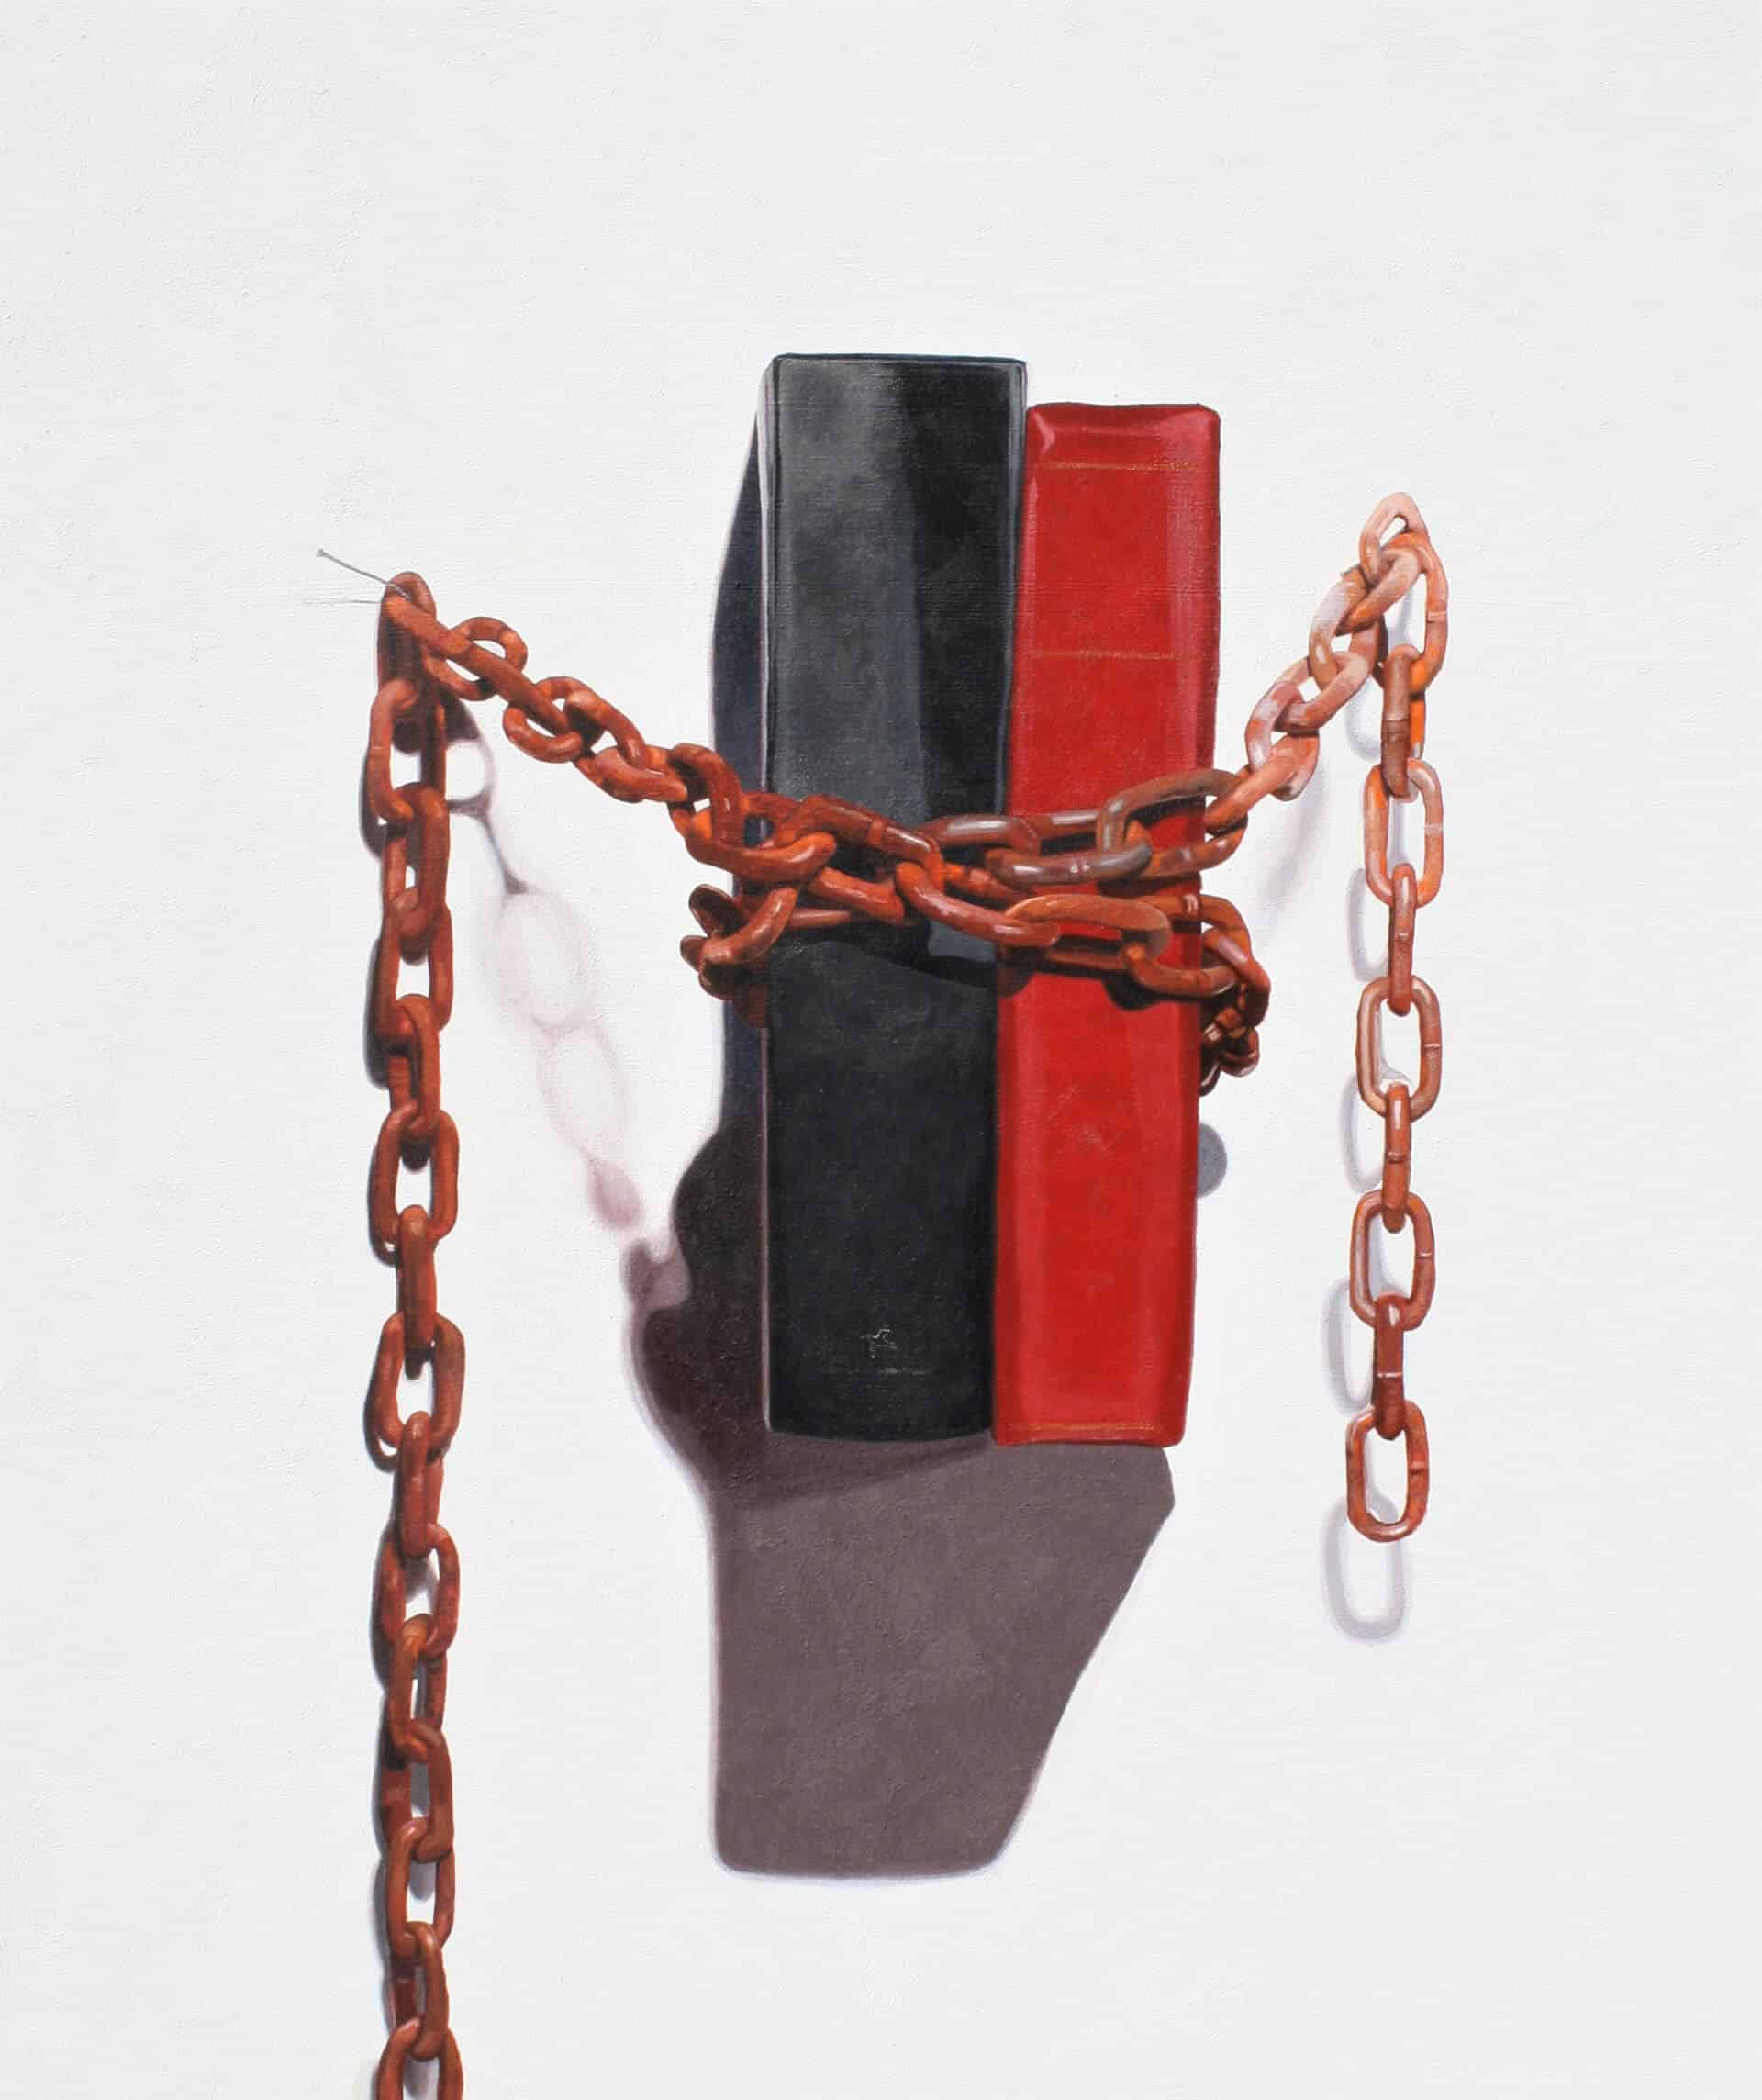 The Same Chains. 91 x 76 cm. Acrylic on canvas 2020. Artist: David Garneau.